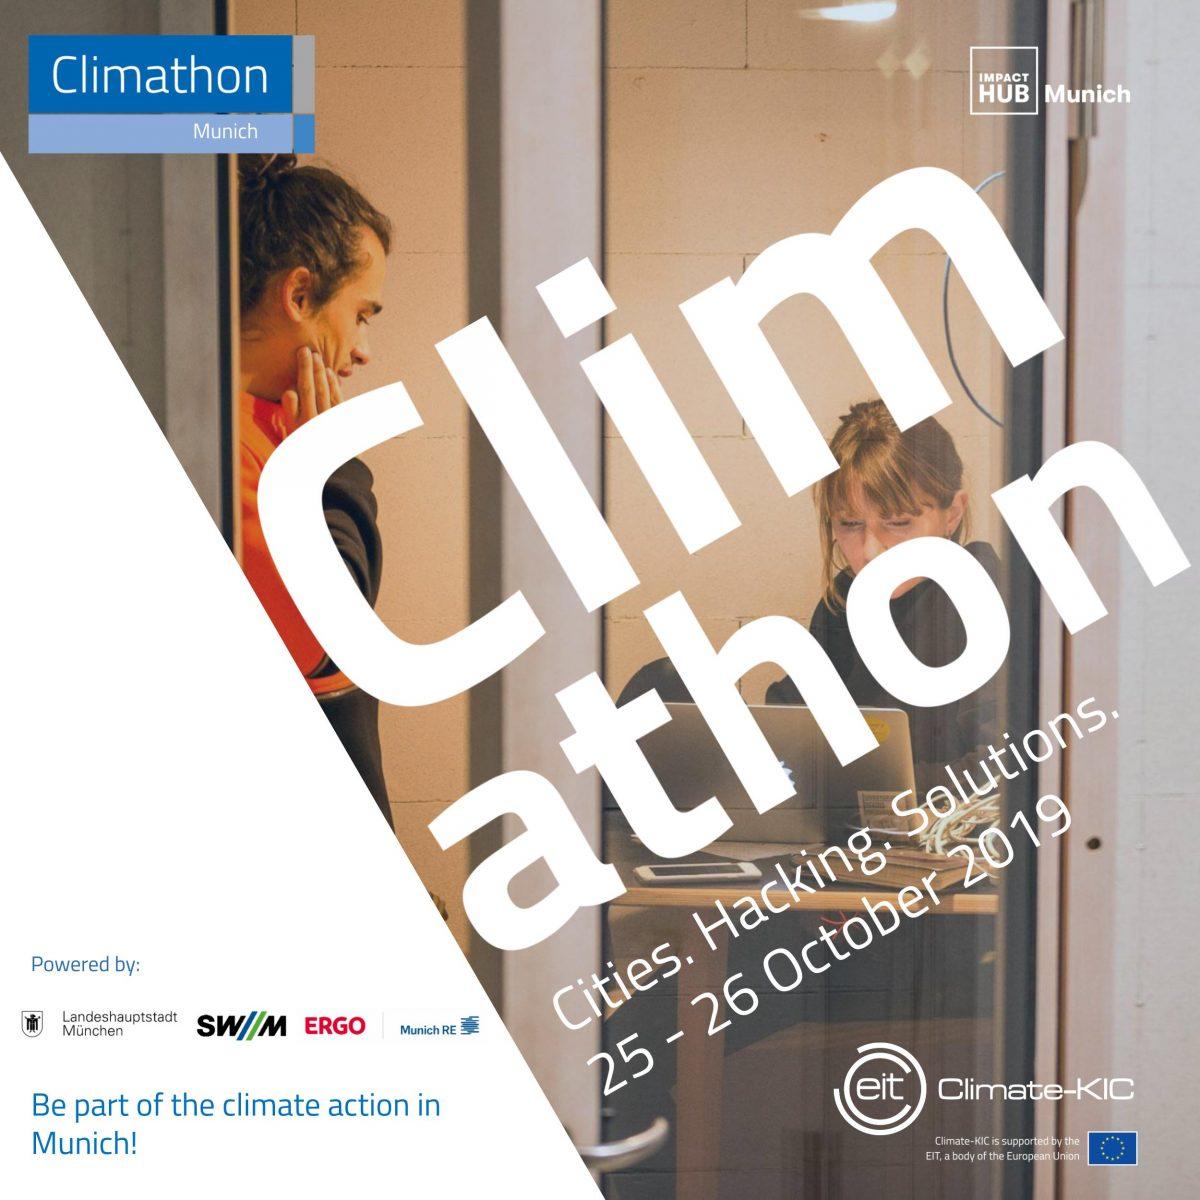 Climathon Munich